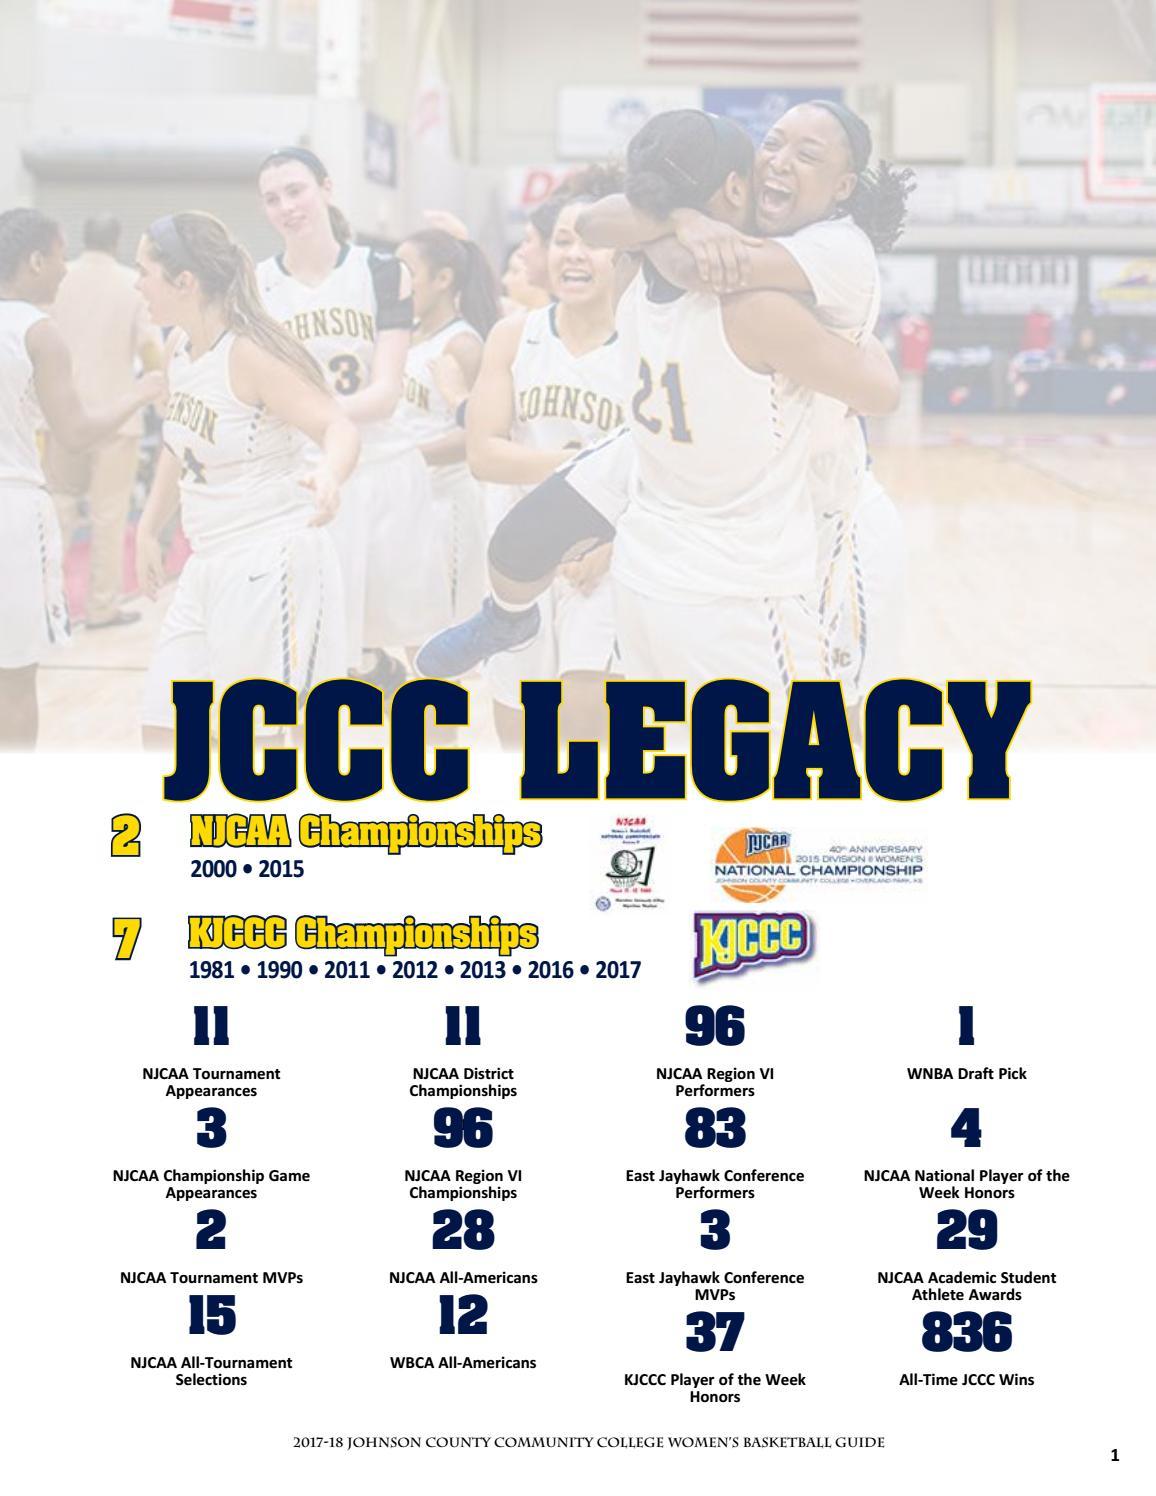 Allamericanamy Naked 2017 18 jccc women's basketball guidechris gray - issuu